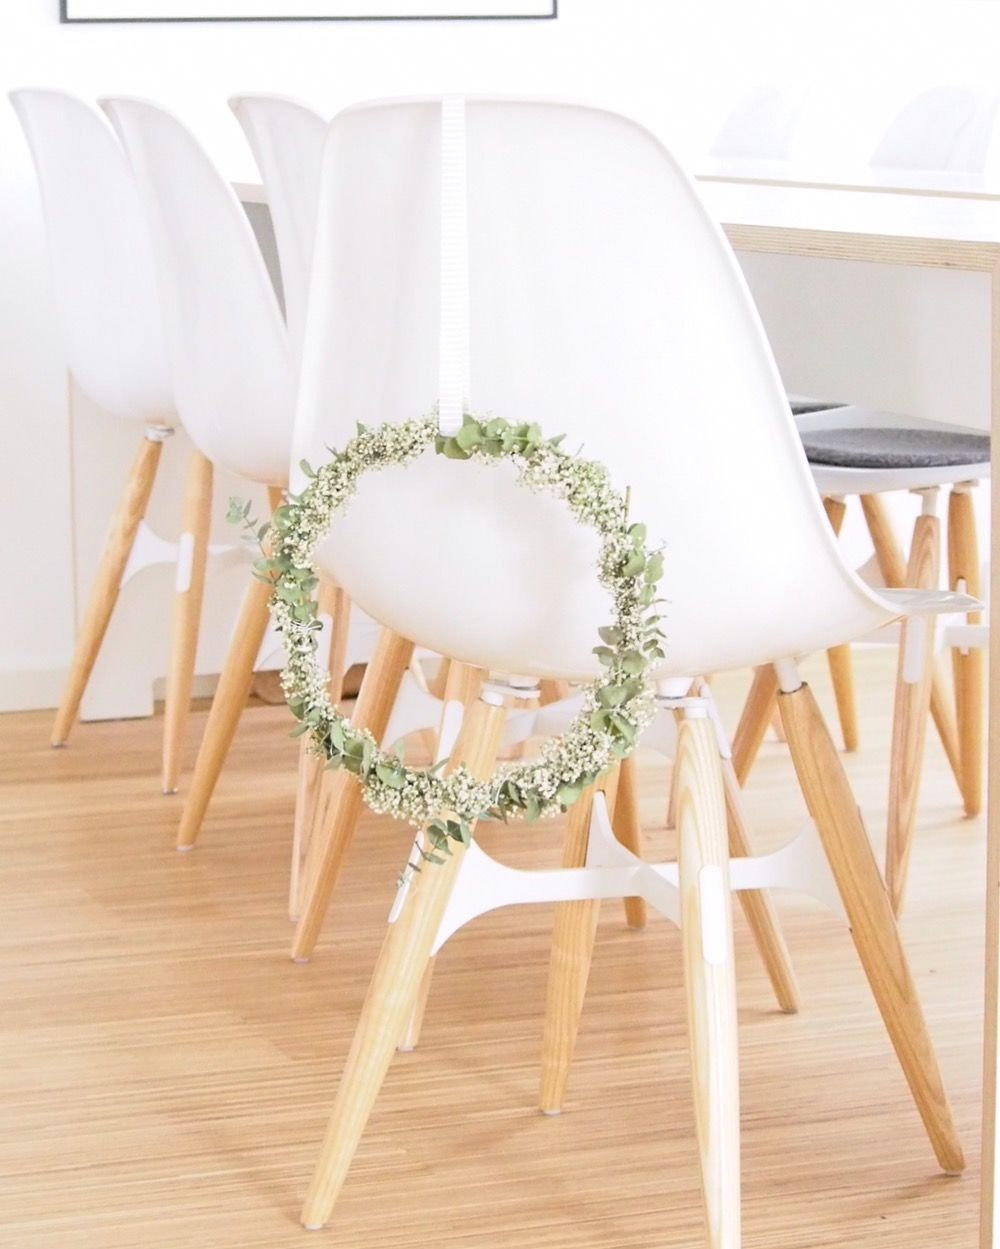 blumenkranz selber binden die besten anleitungen ideen. Black Bedroom Furniture Sets. Home Design Ideas